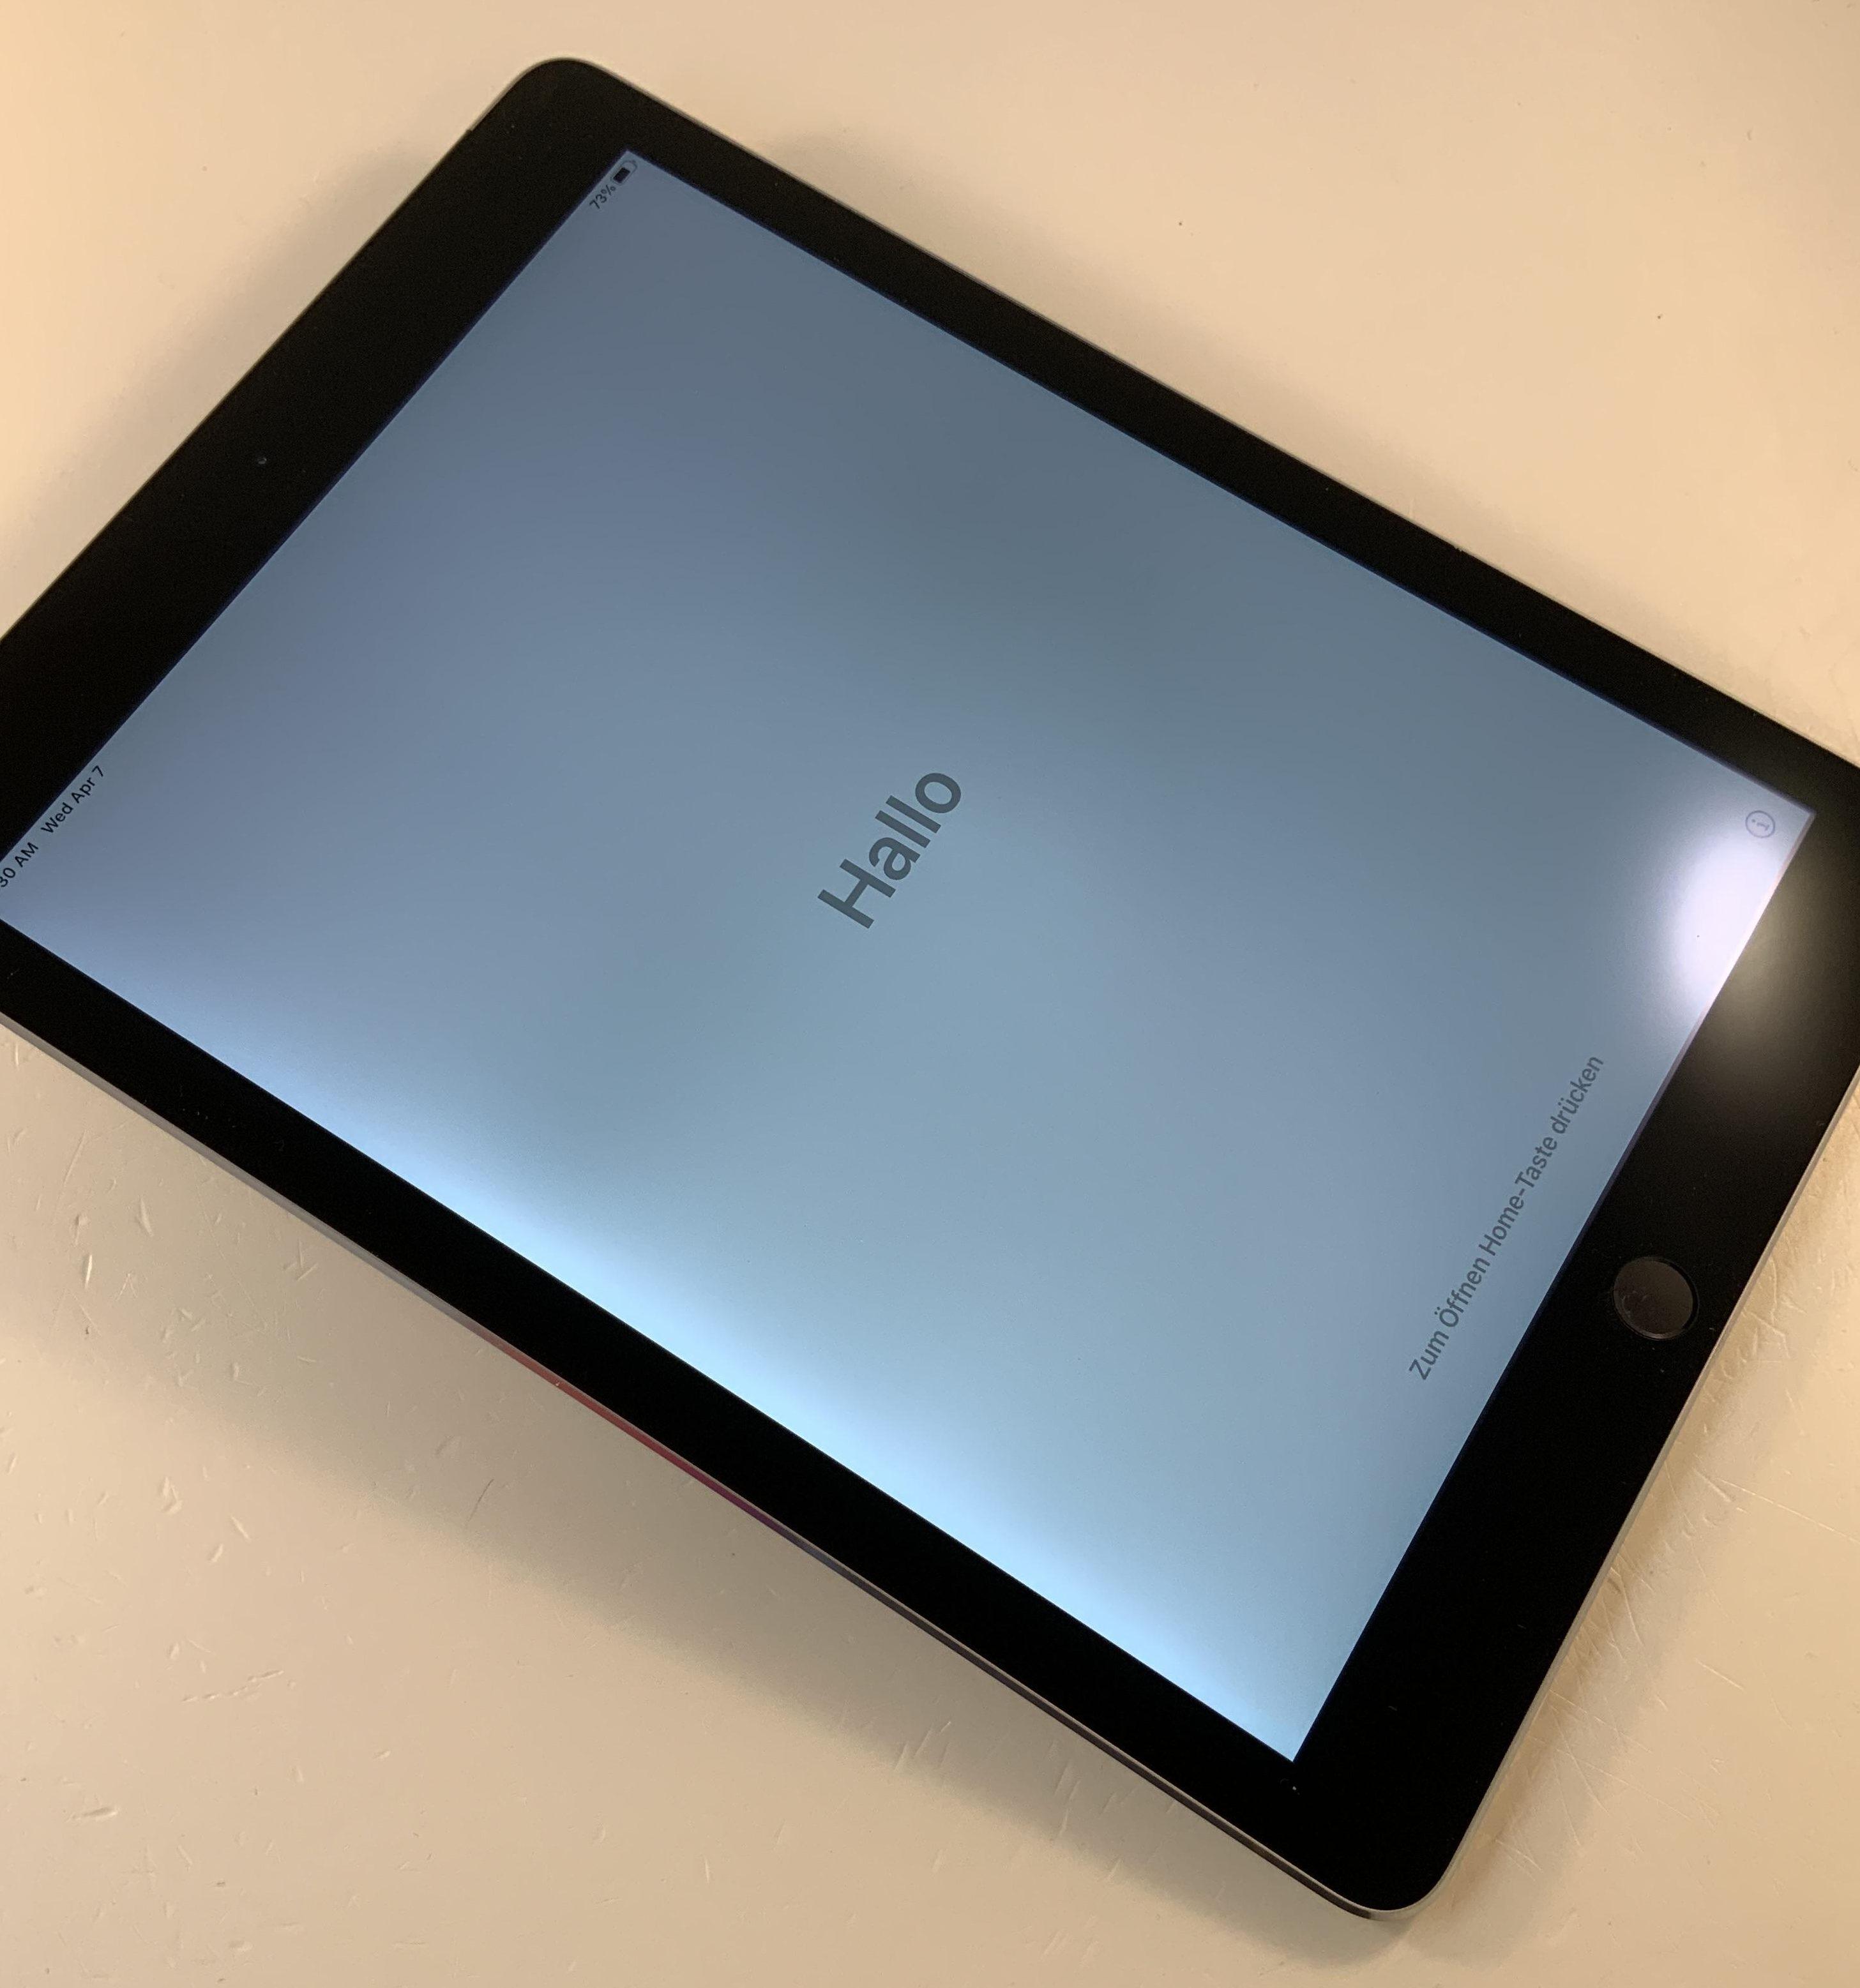 iPad Air 2 Wi-Fi + Cellular 64GB, 64GB, Space Gray, obraz 5